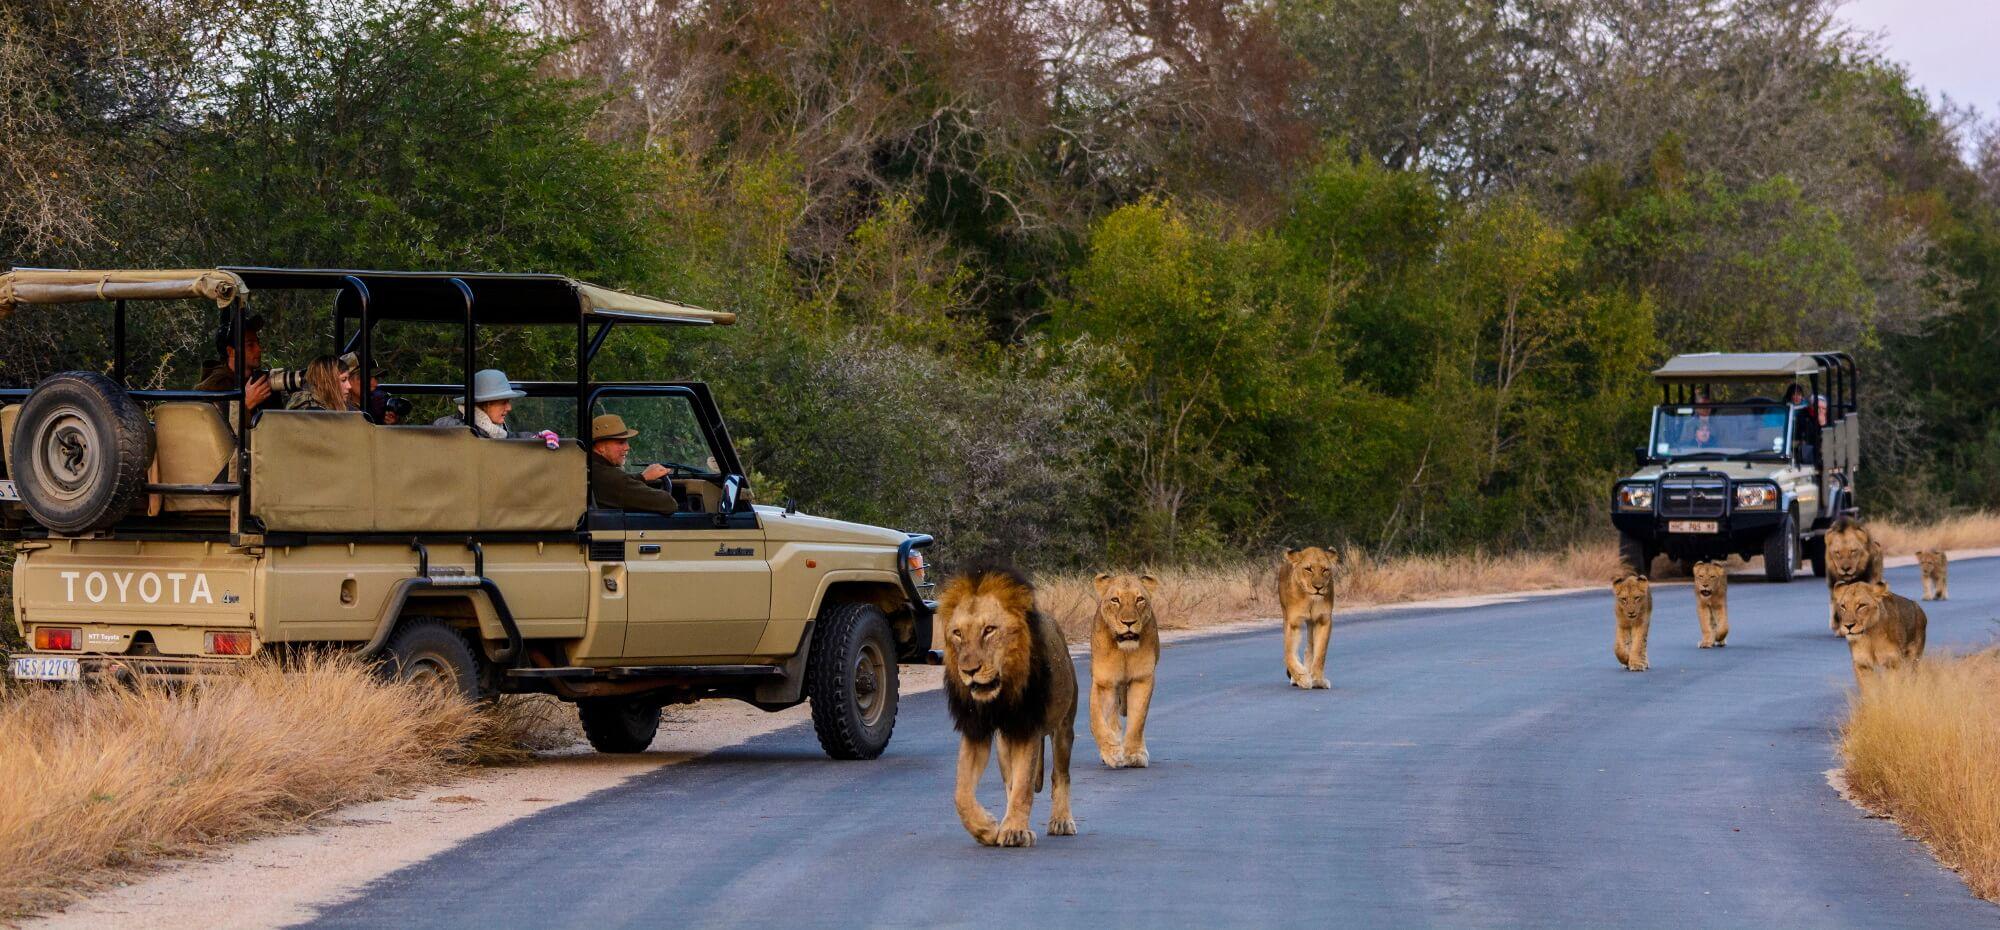 twee safari jeeps met leeuwen